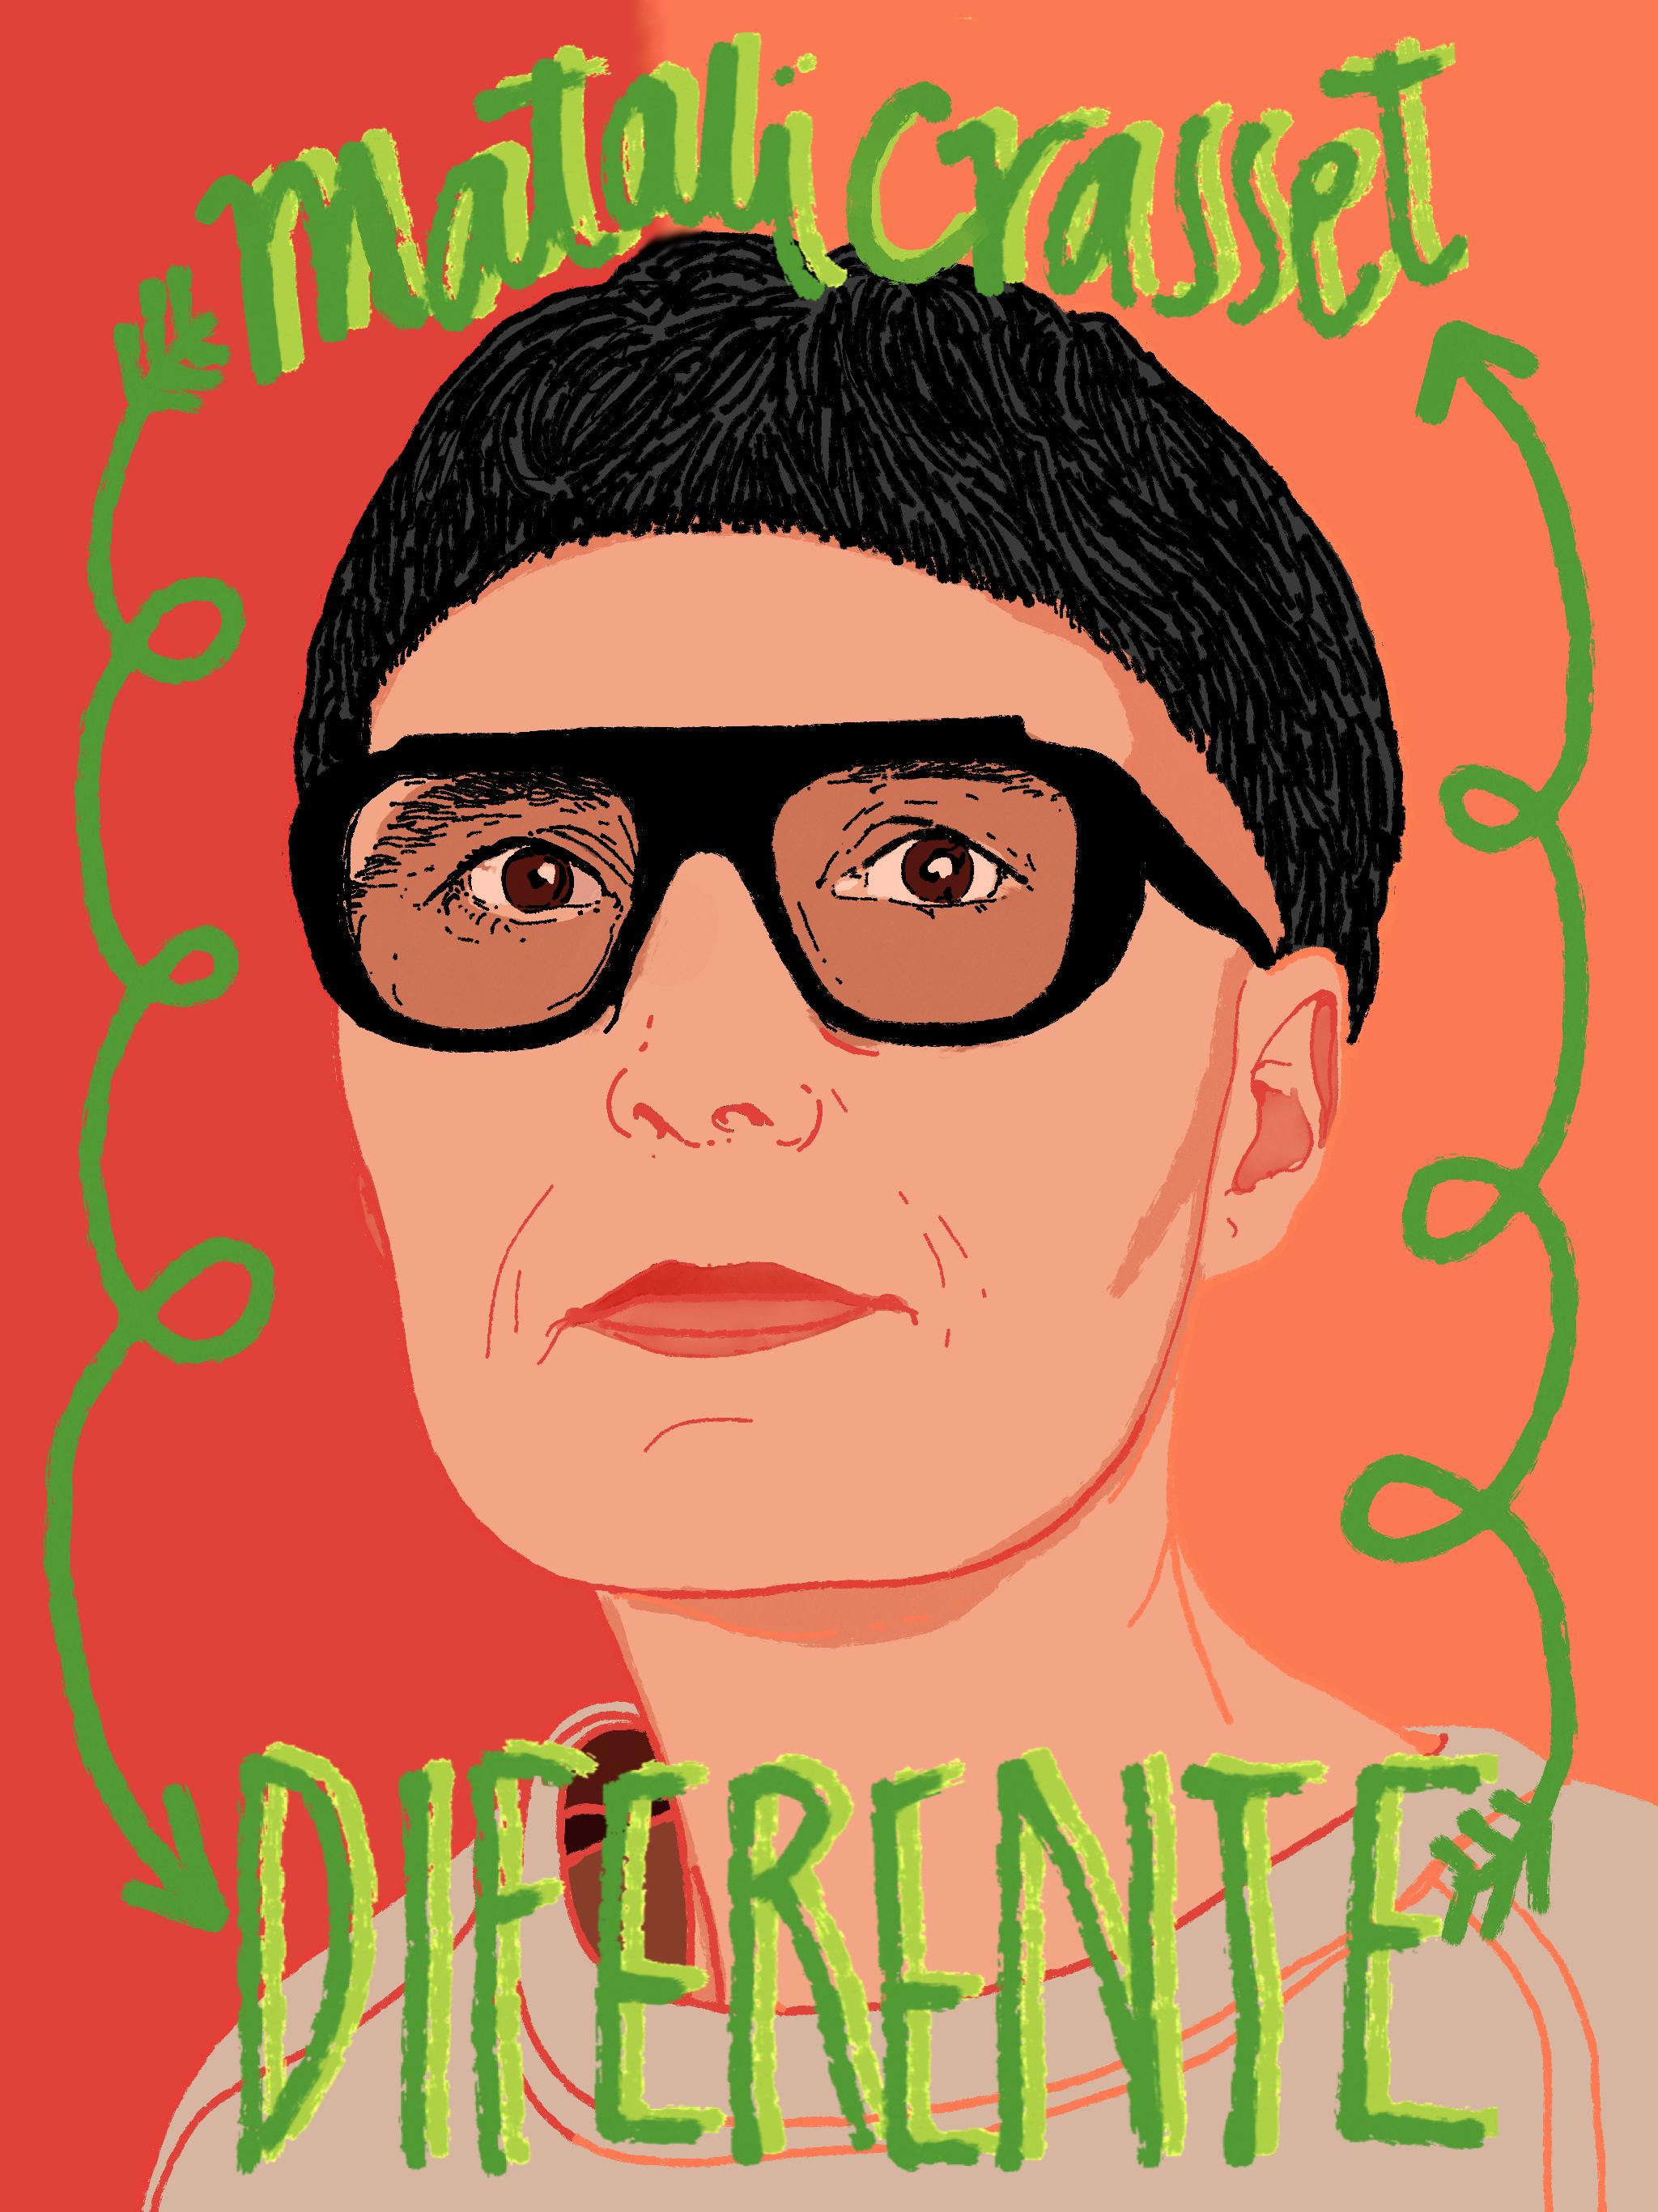 #GalaDaMilano:matali crasset, la creadora integral